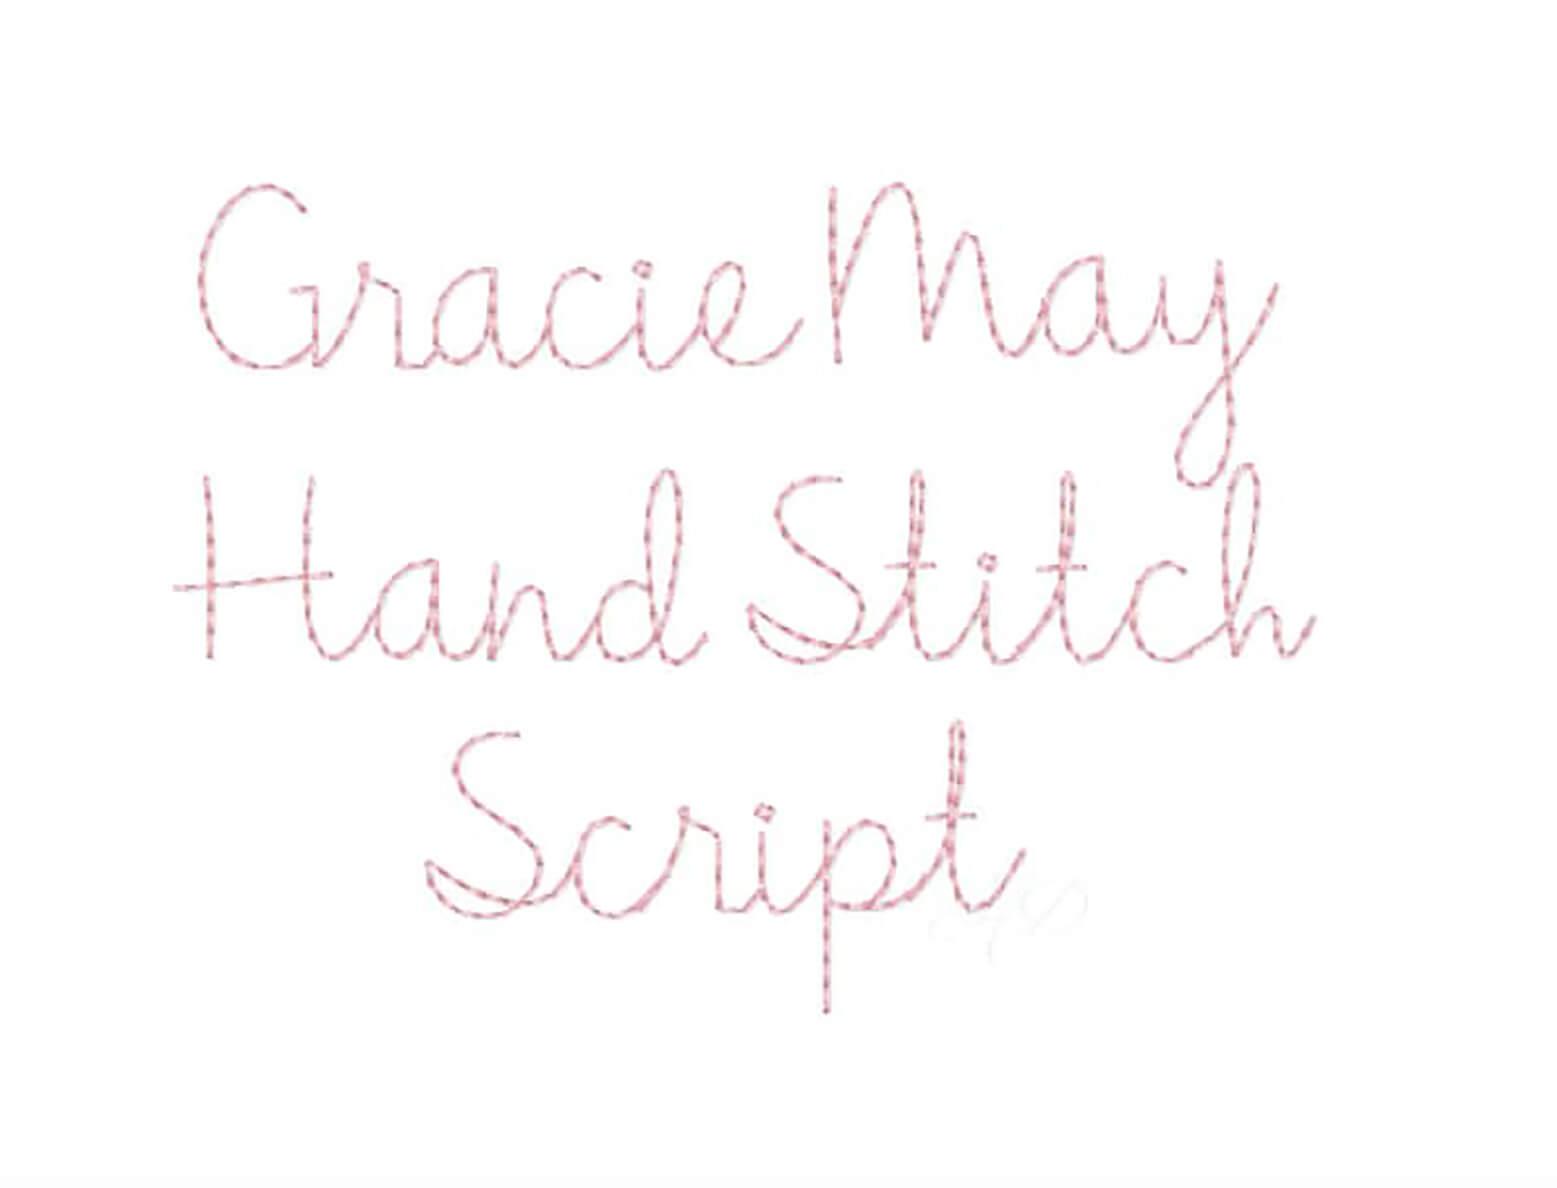 Gracie May Hand Stitch Script